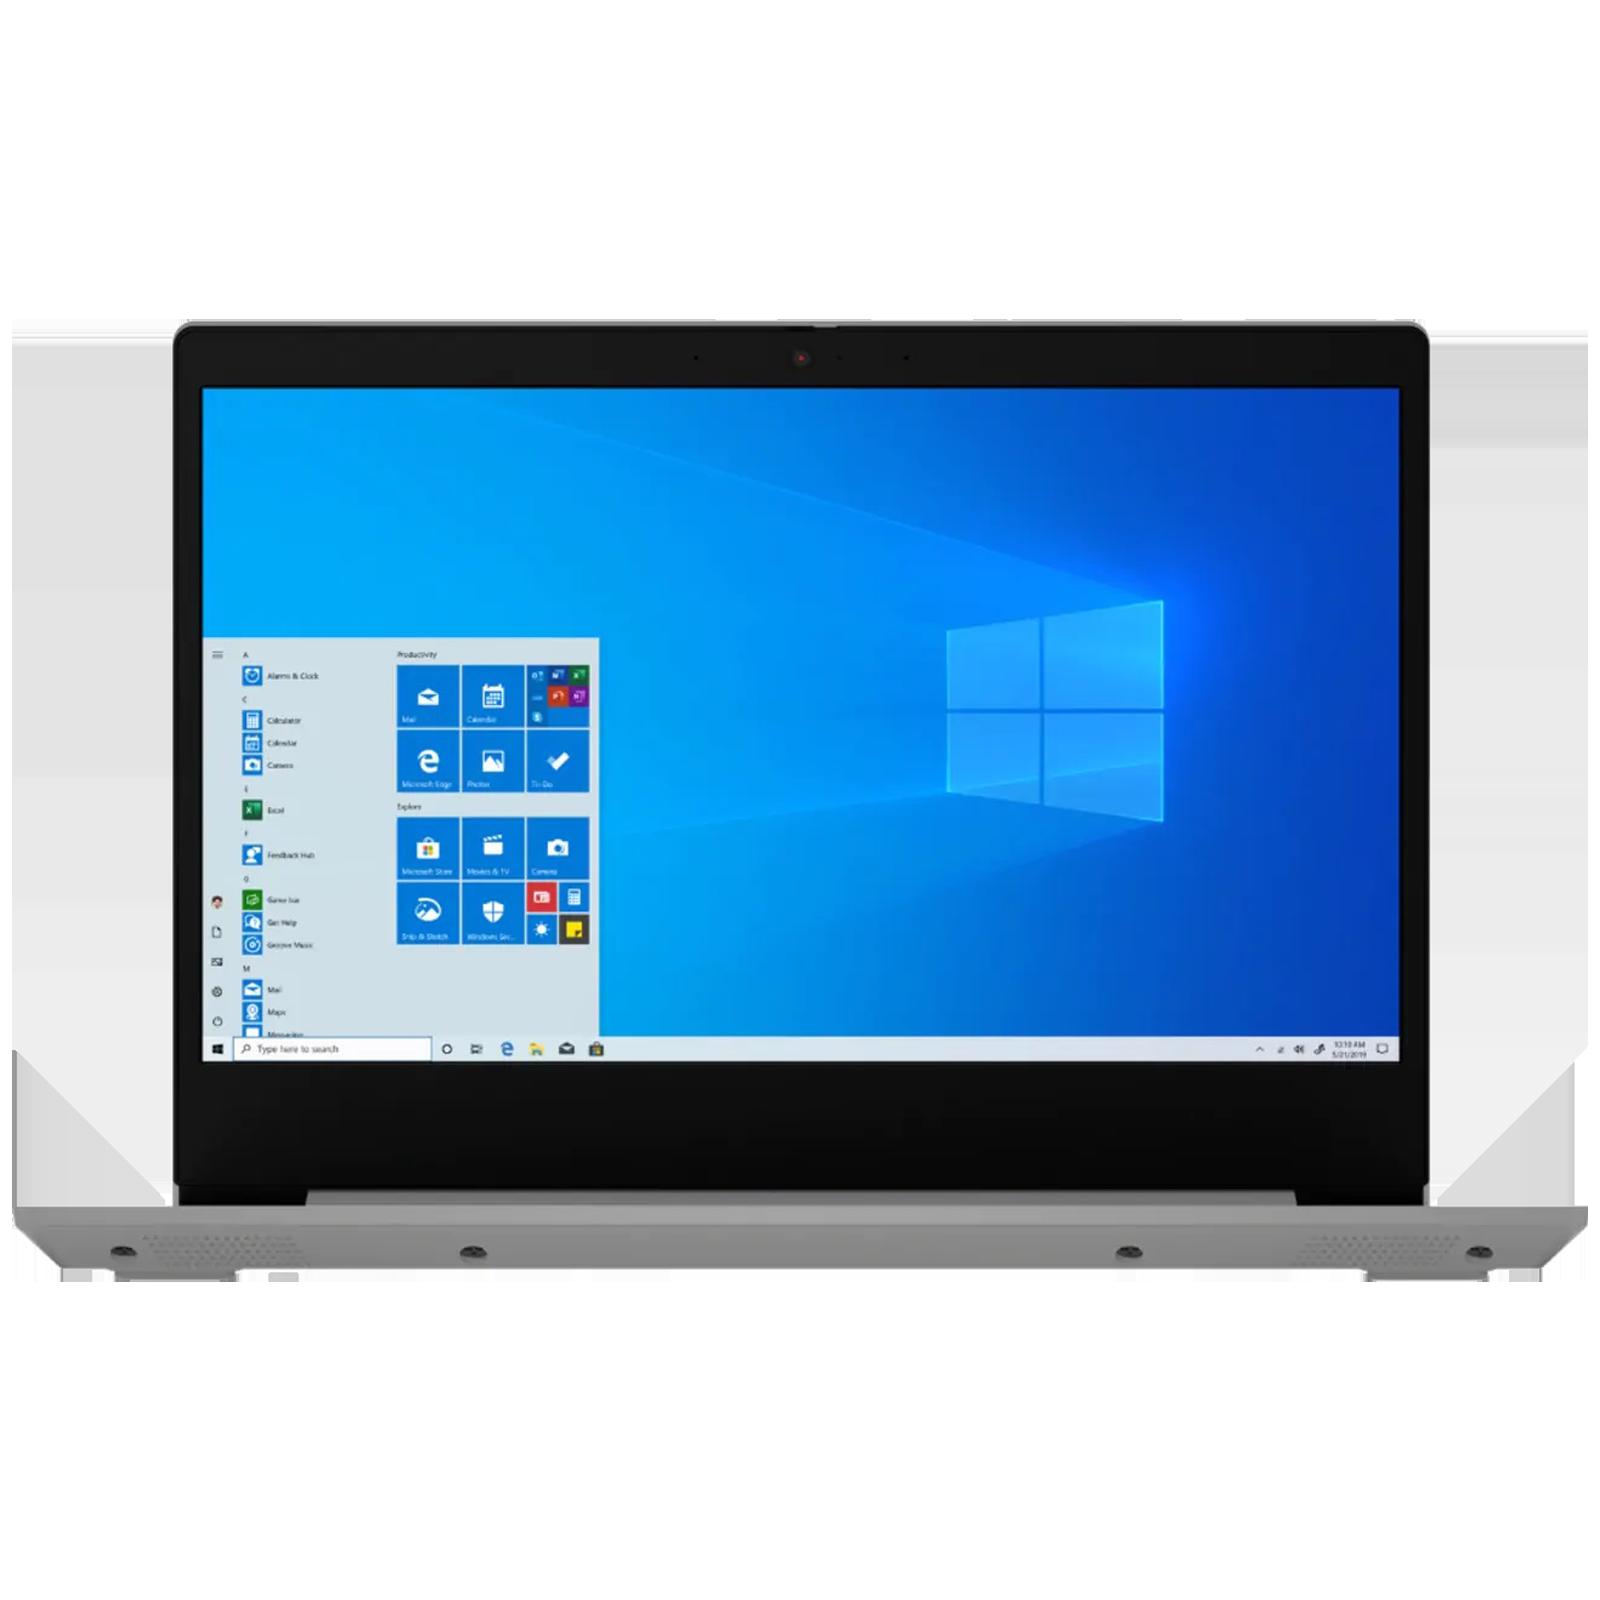 Lenovo Slim 3 (82H700KLIN) Core i3 11th Gen Windows 10 Thin and Light Laptop (8GB RAM, 256GB SSD, Intel UHD Graphics, MS Office, 35.56cm, Grey)_1